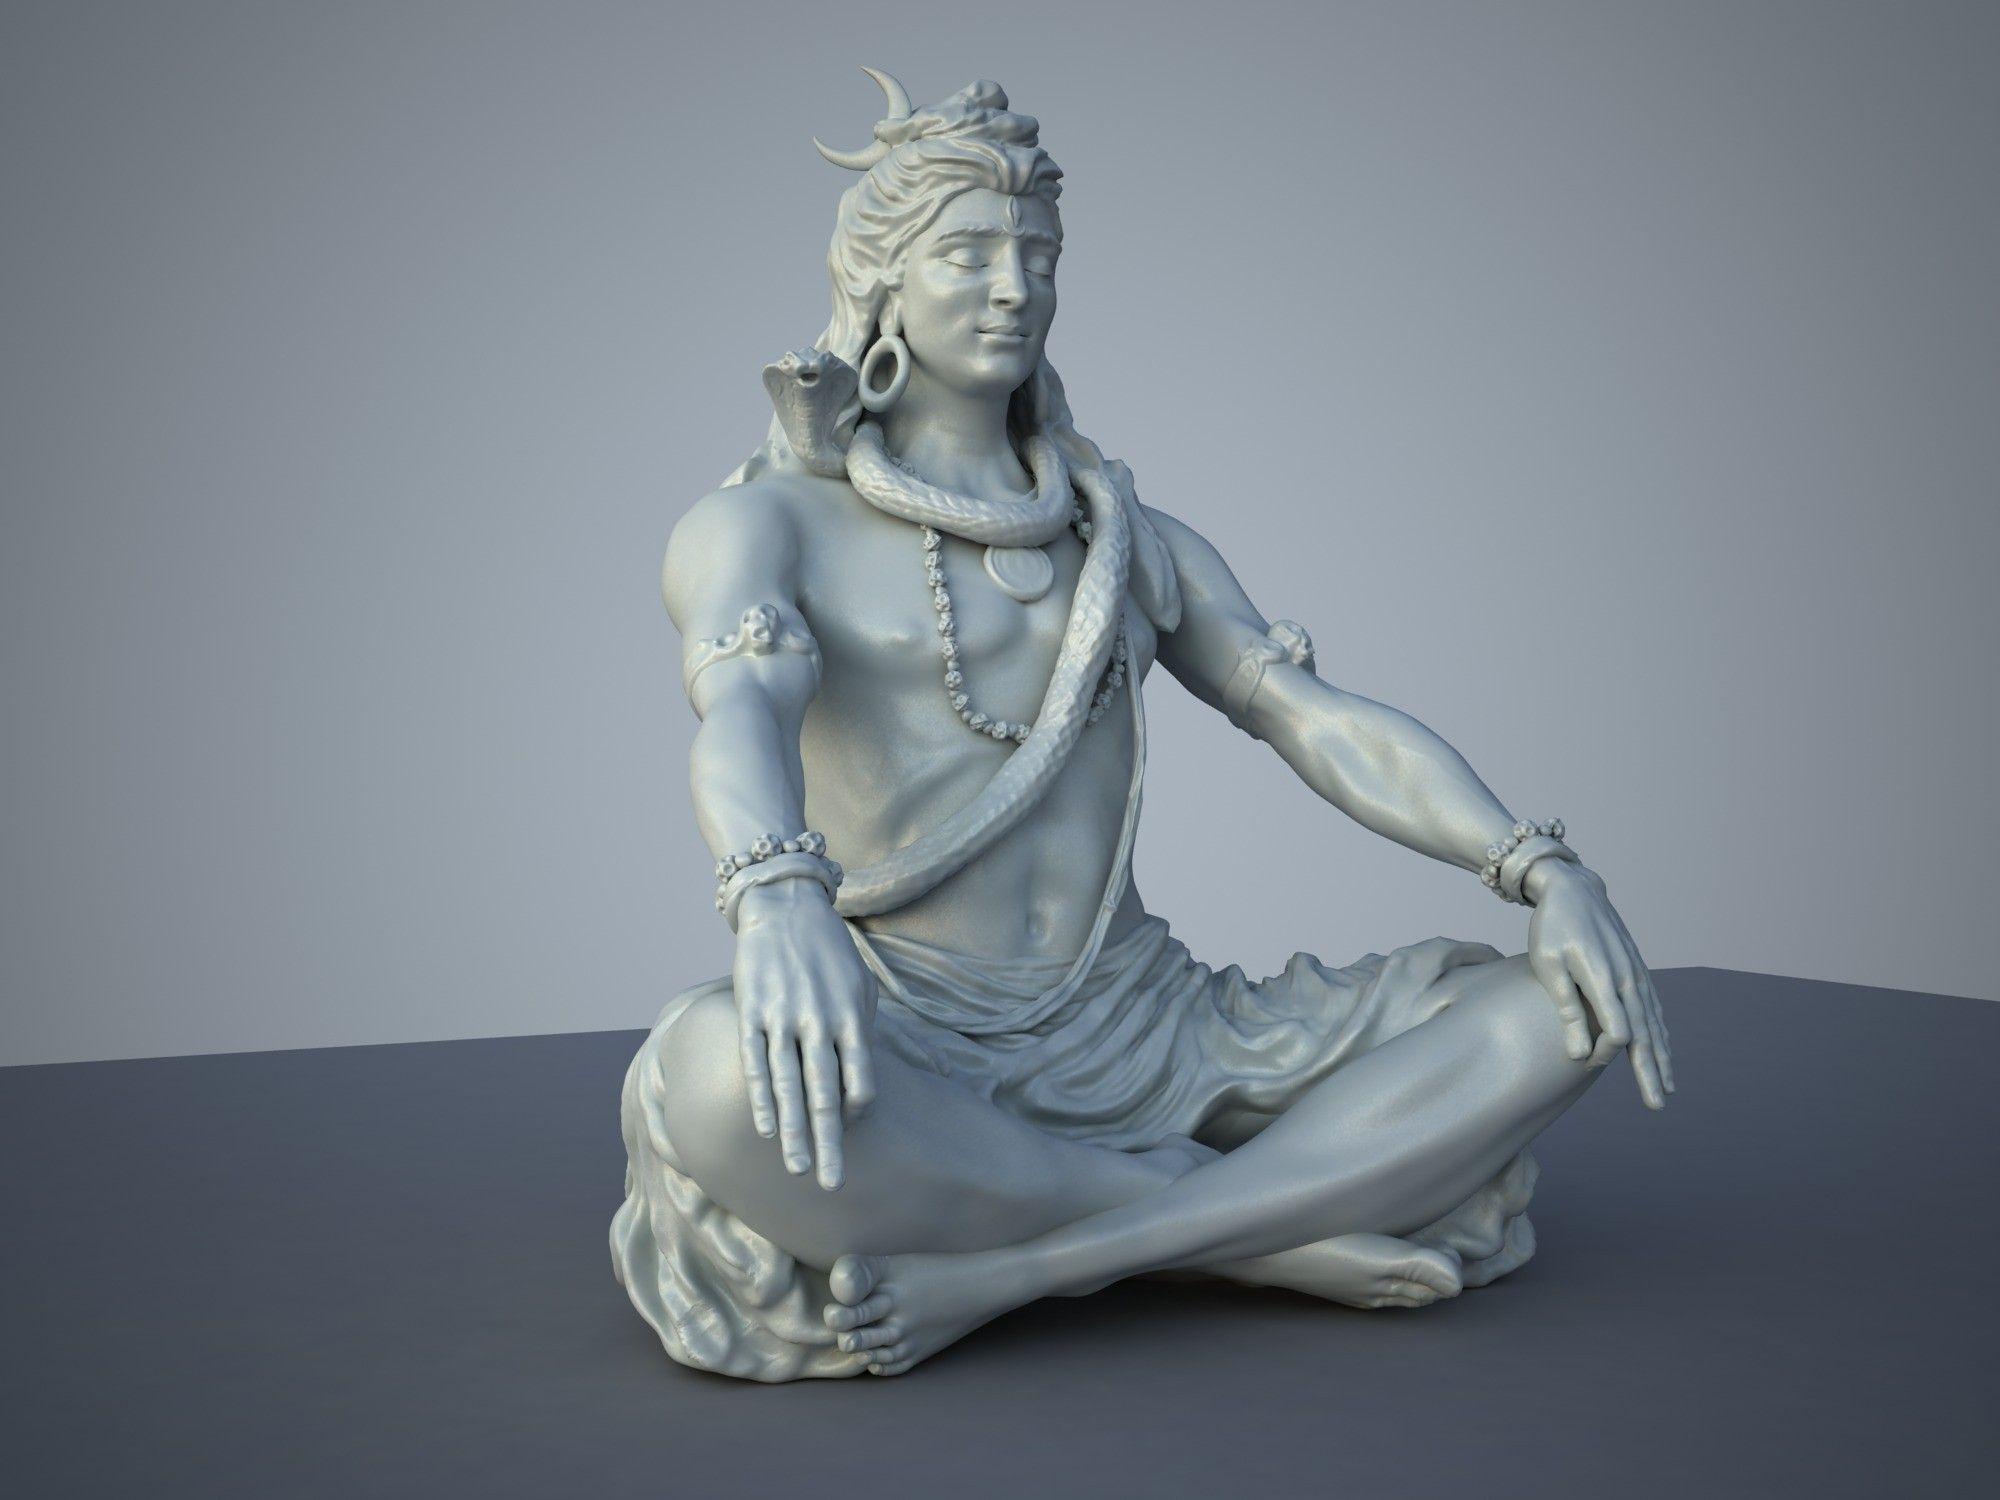 Pin by Aroub Shah on UP Board | Lord shiva statue, Shiva